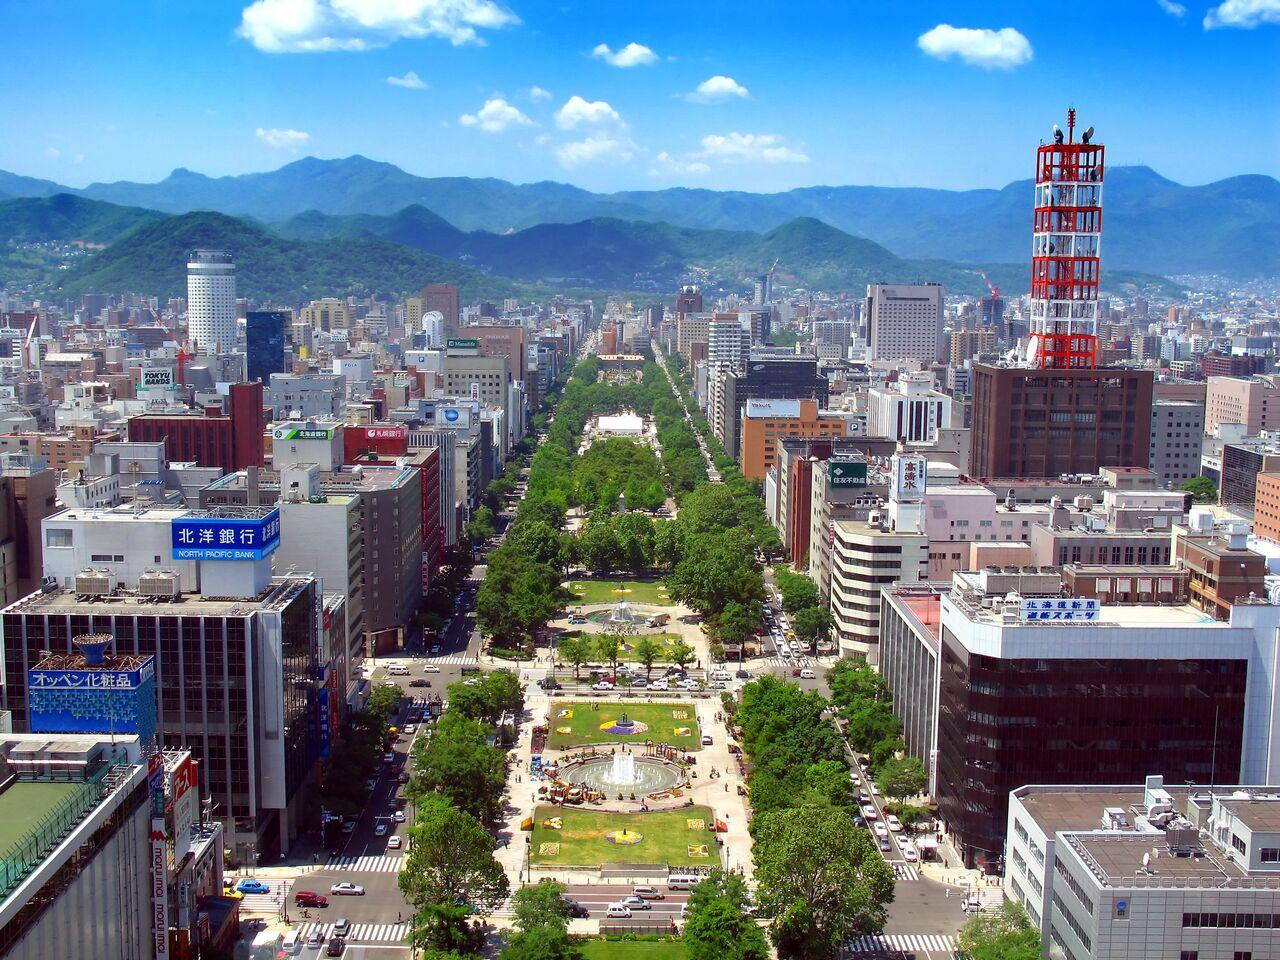 2014 Sapporo, Japan